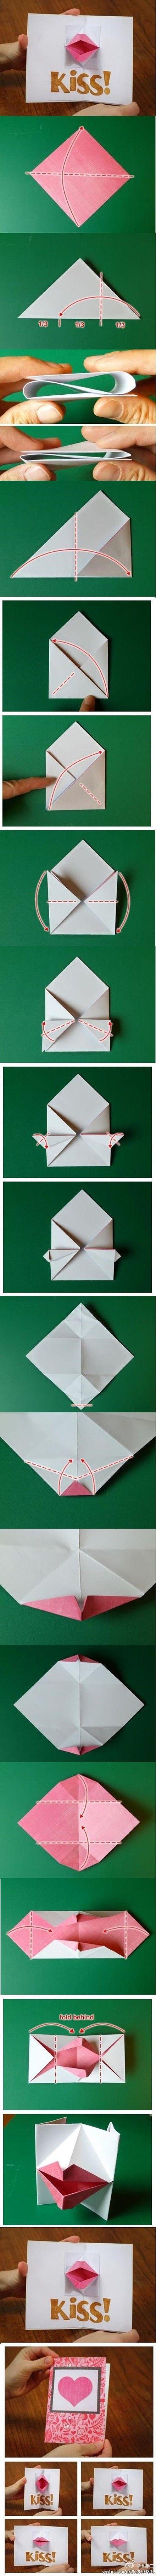 Pop up kiss card koen kamp pinterest kiss origami cards and